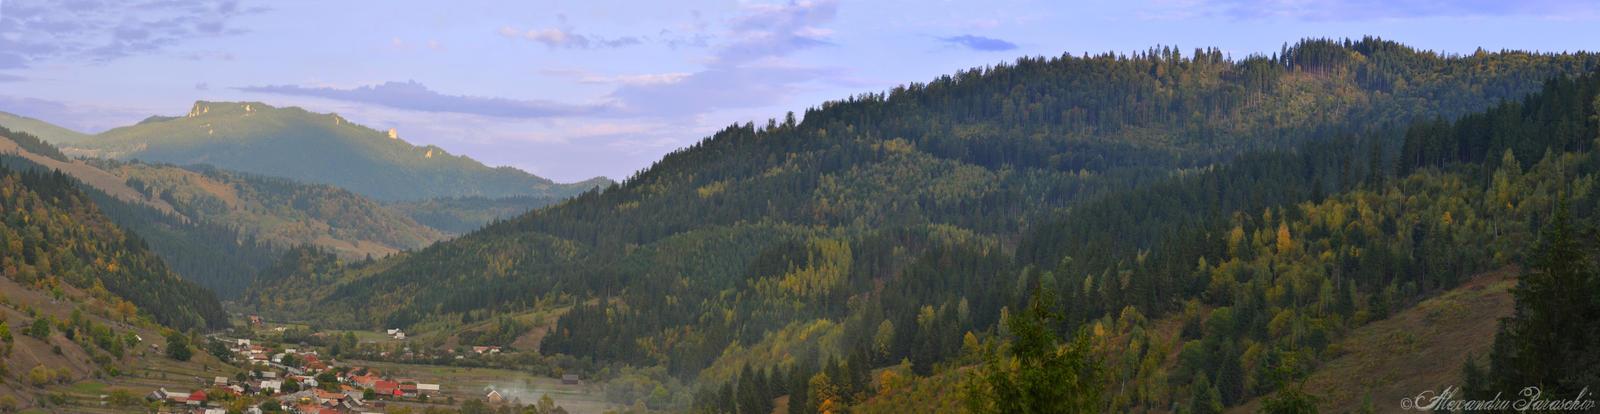 Romanian paradise by AlecsPS